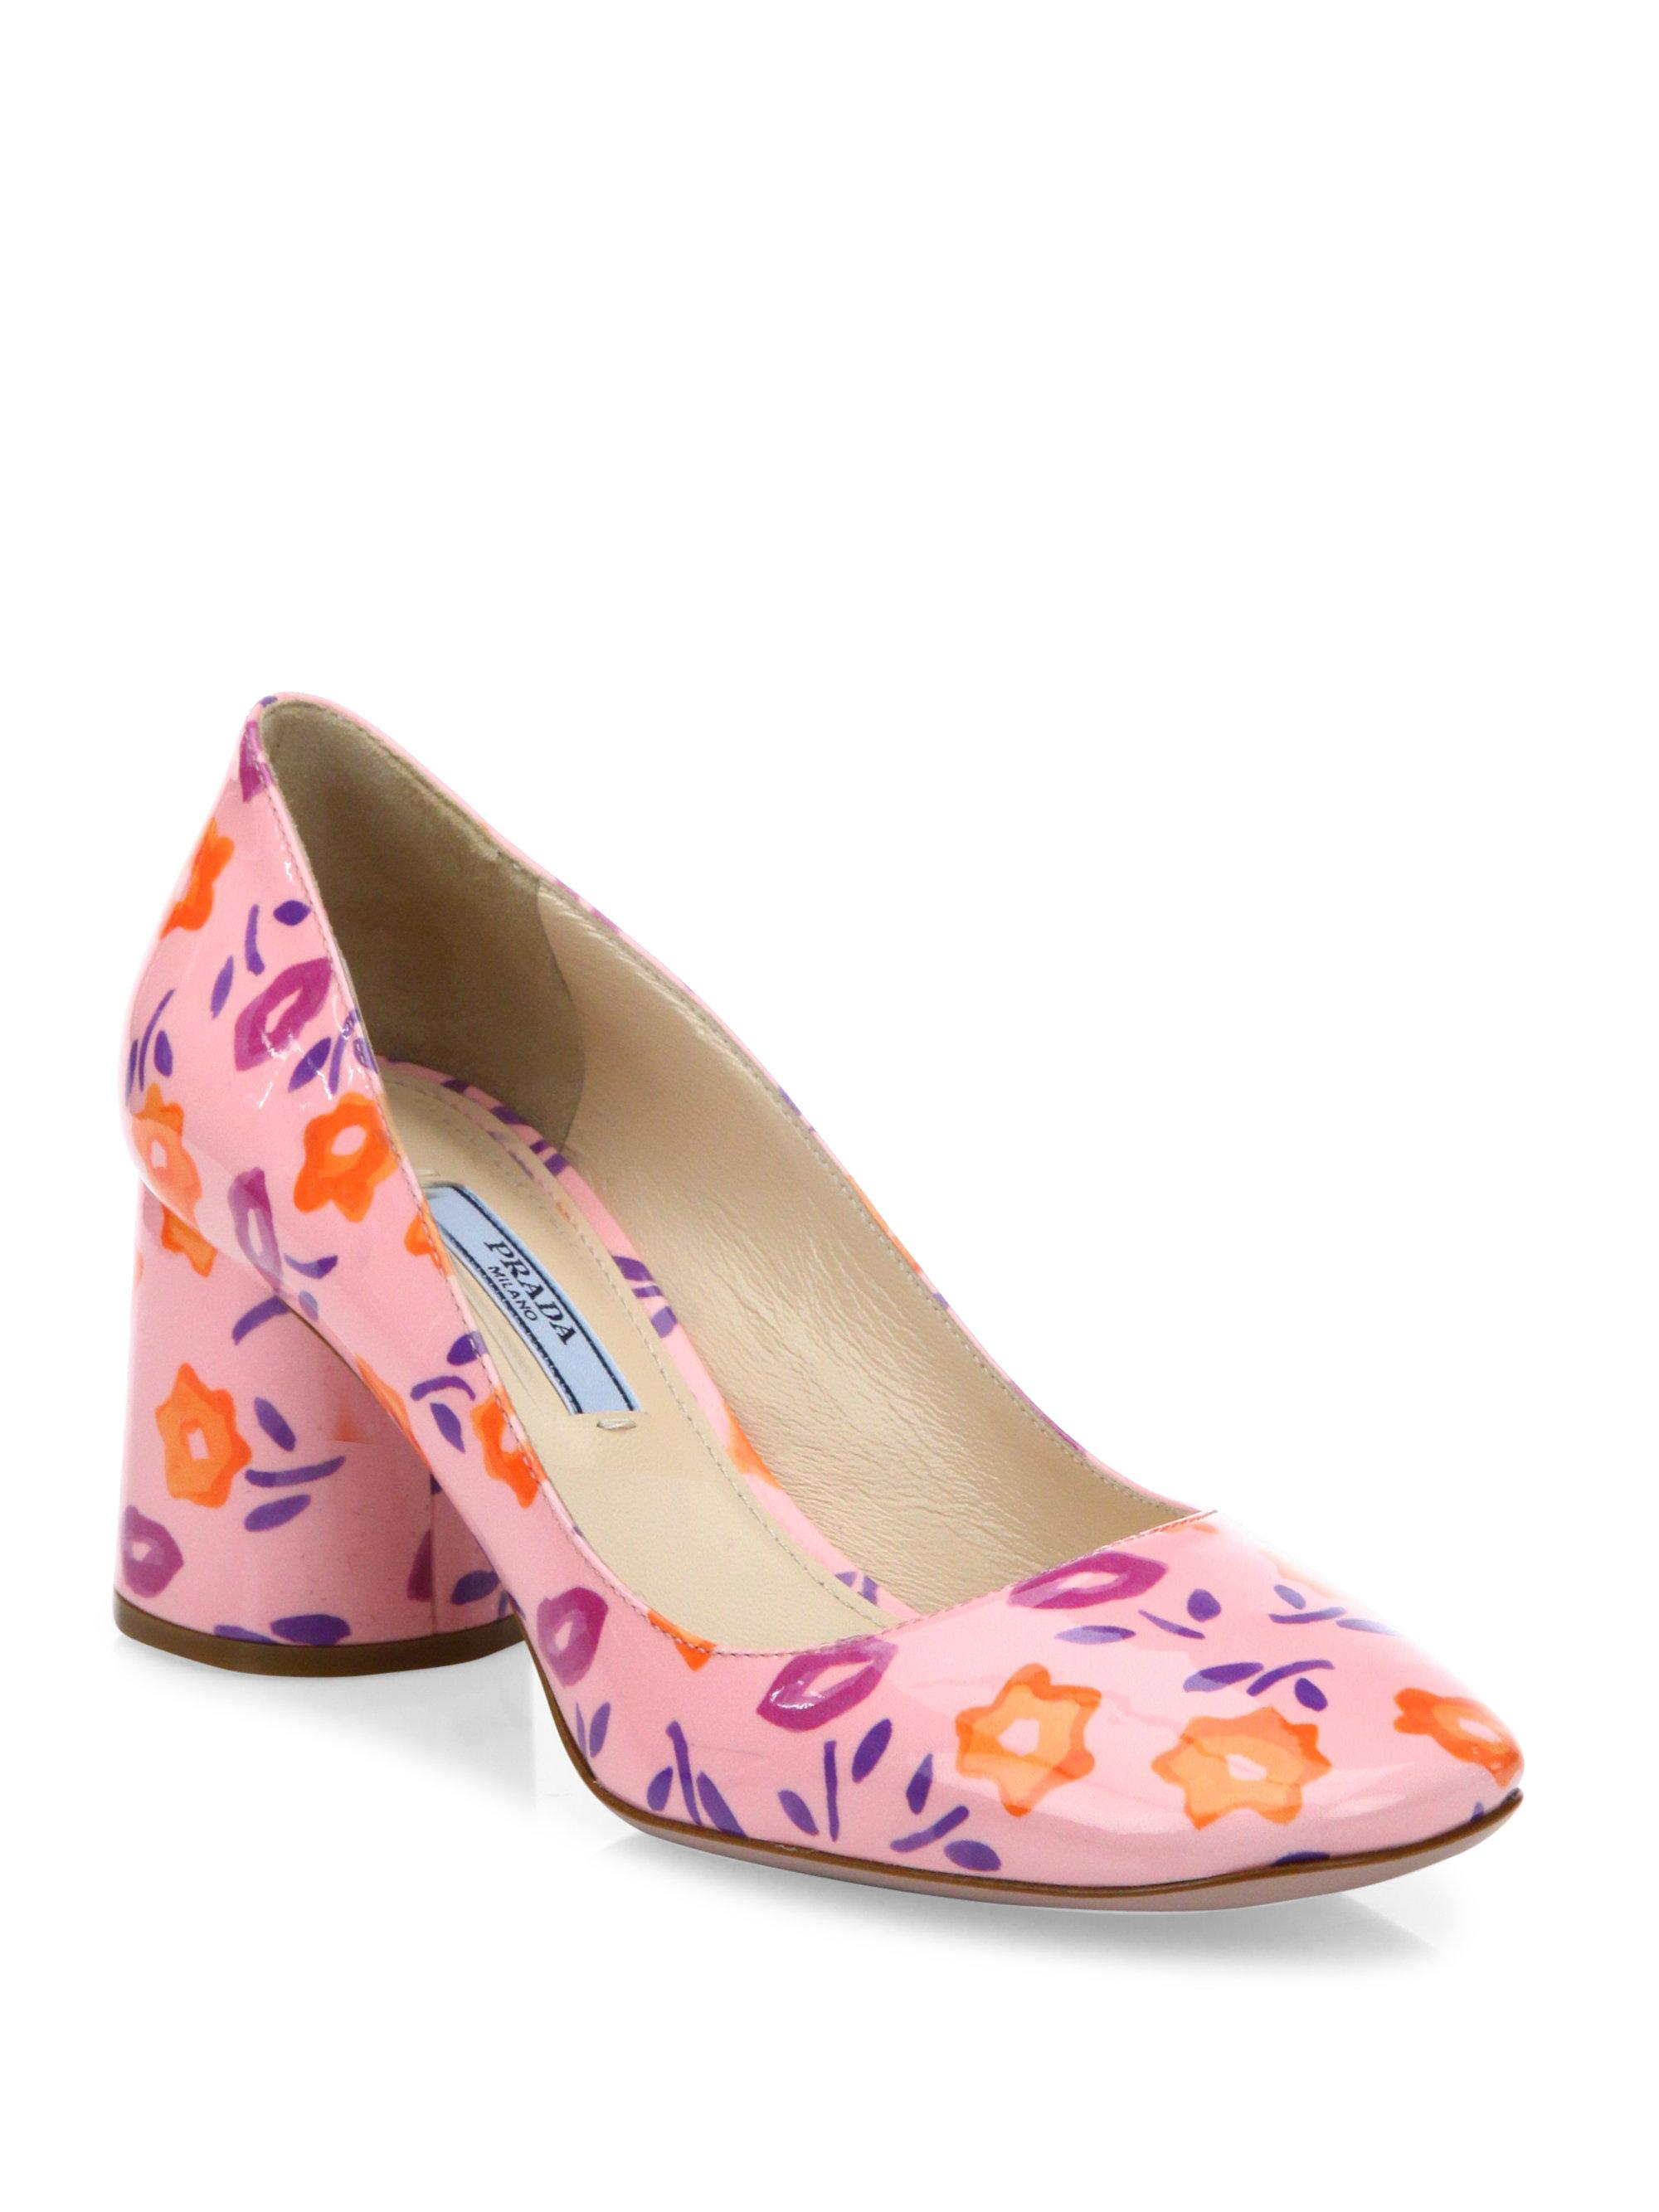 Lyst prada flower print patent leather block heel pumps in pink gallery mightylinksfo